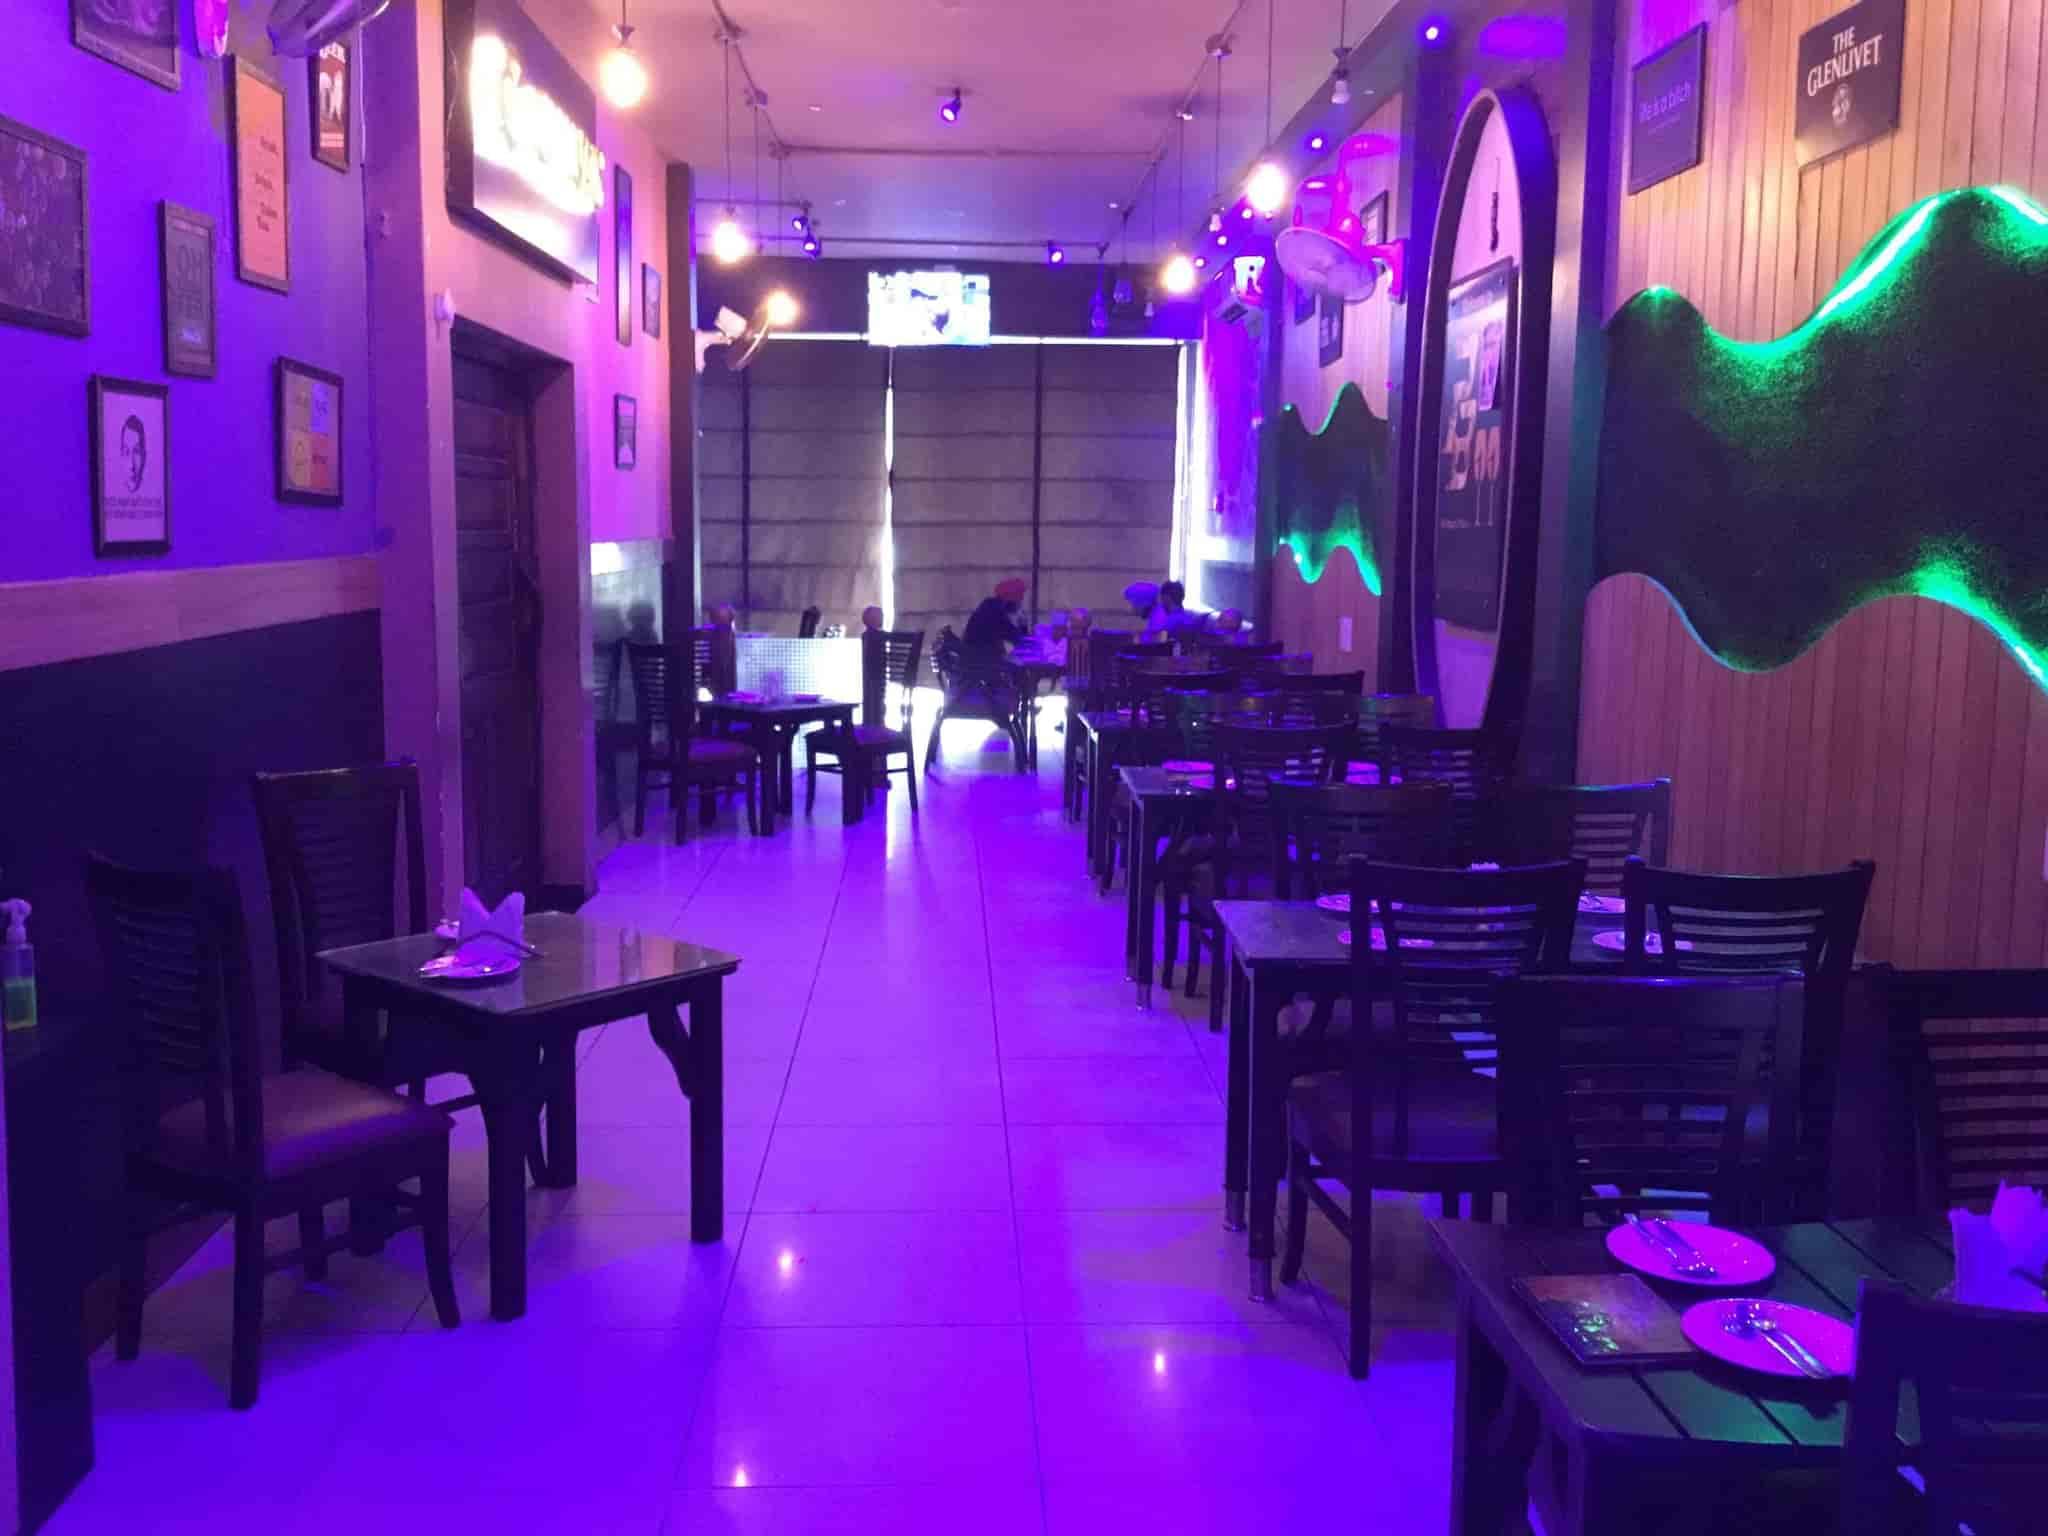 Pb 11 Bar & Lounge, Patiala - Lounge Bars - Justdial